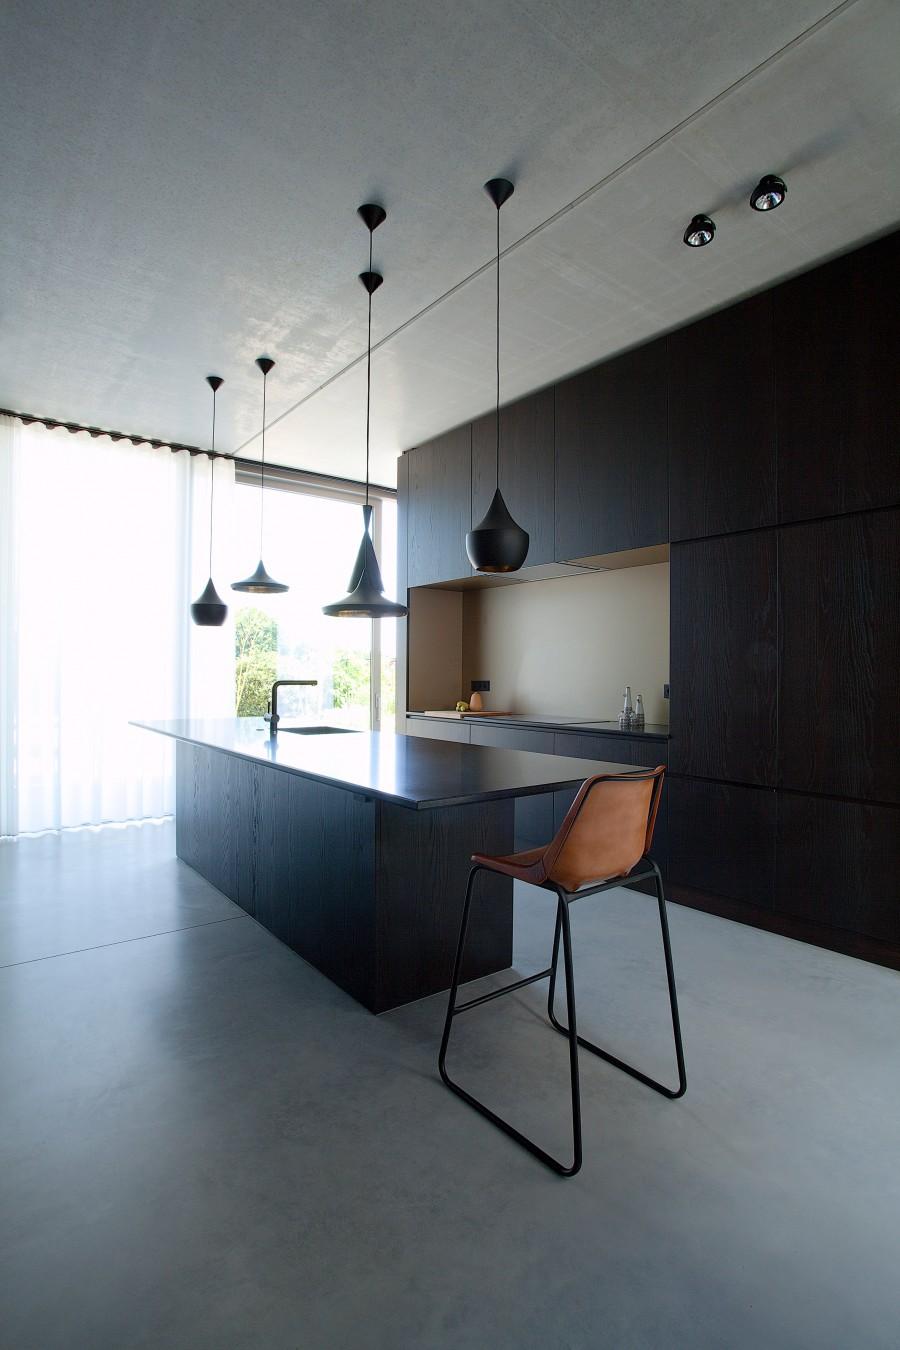 concrete-house-in-belgium-aprilandmay5